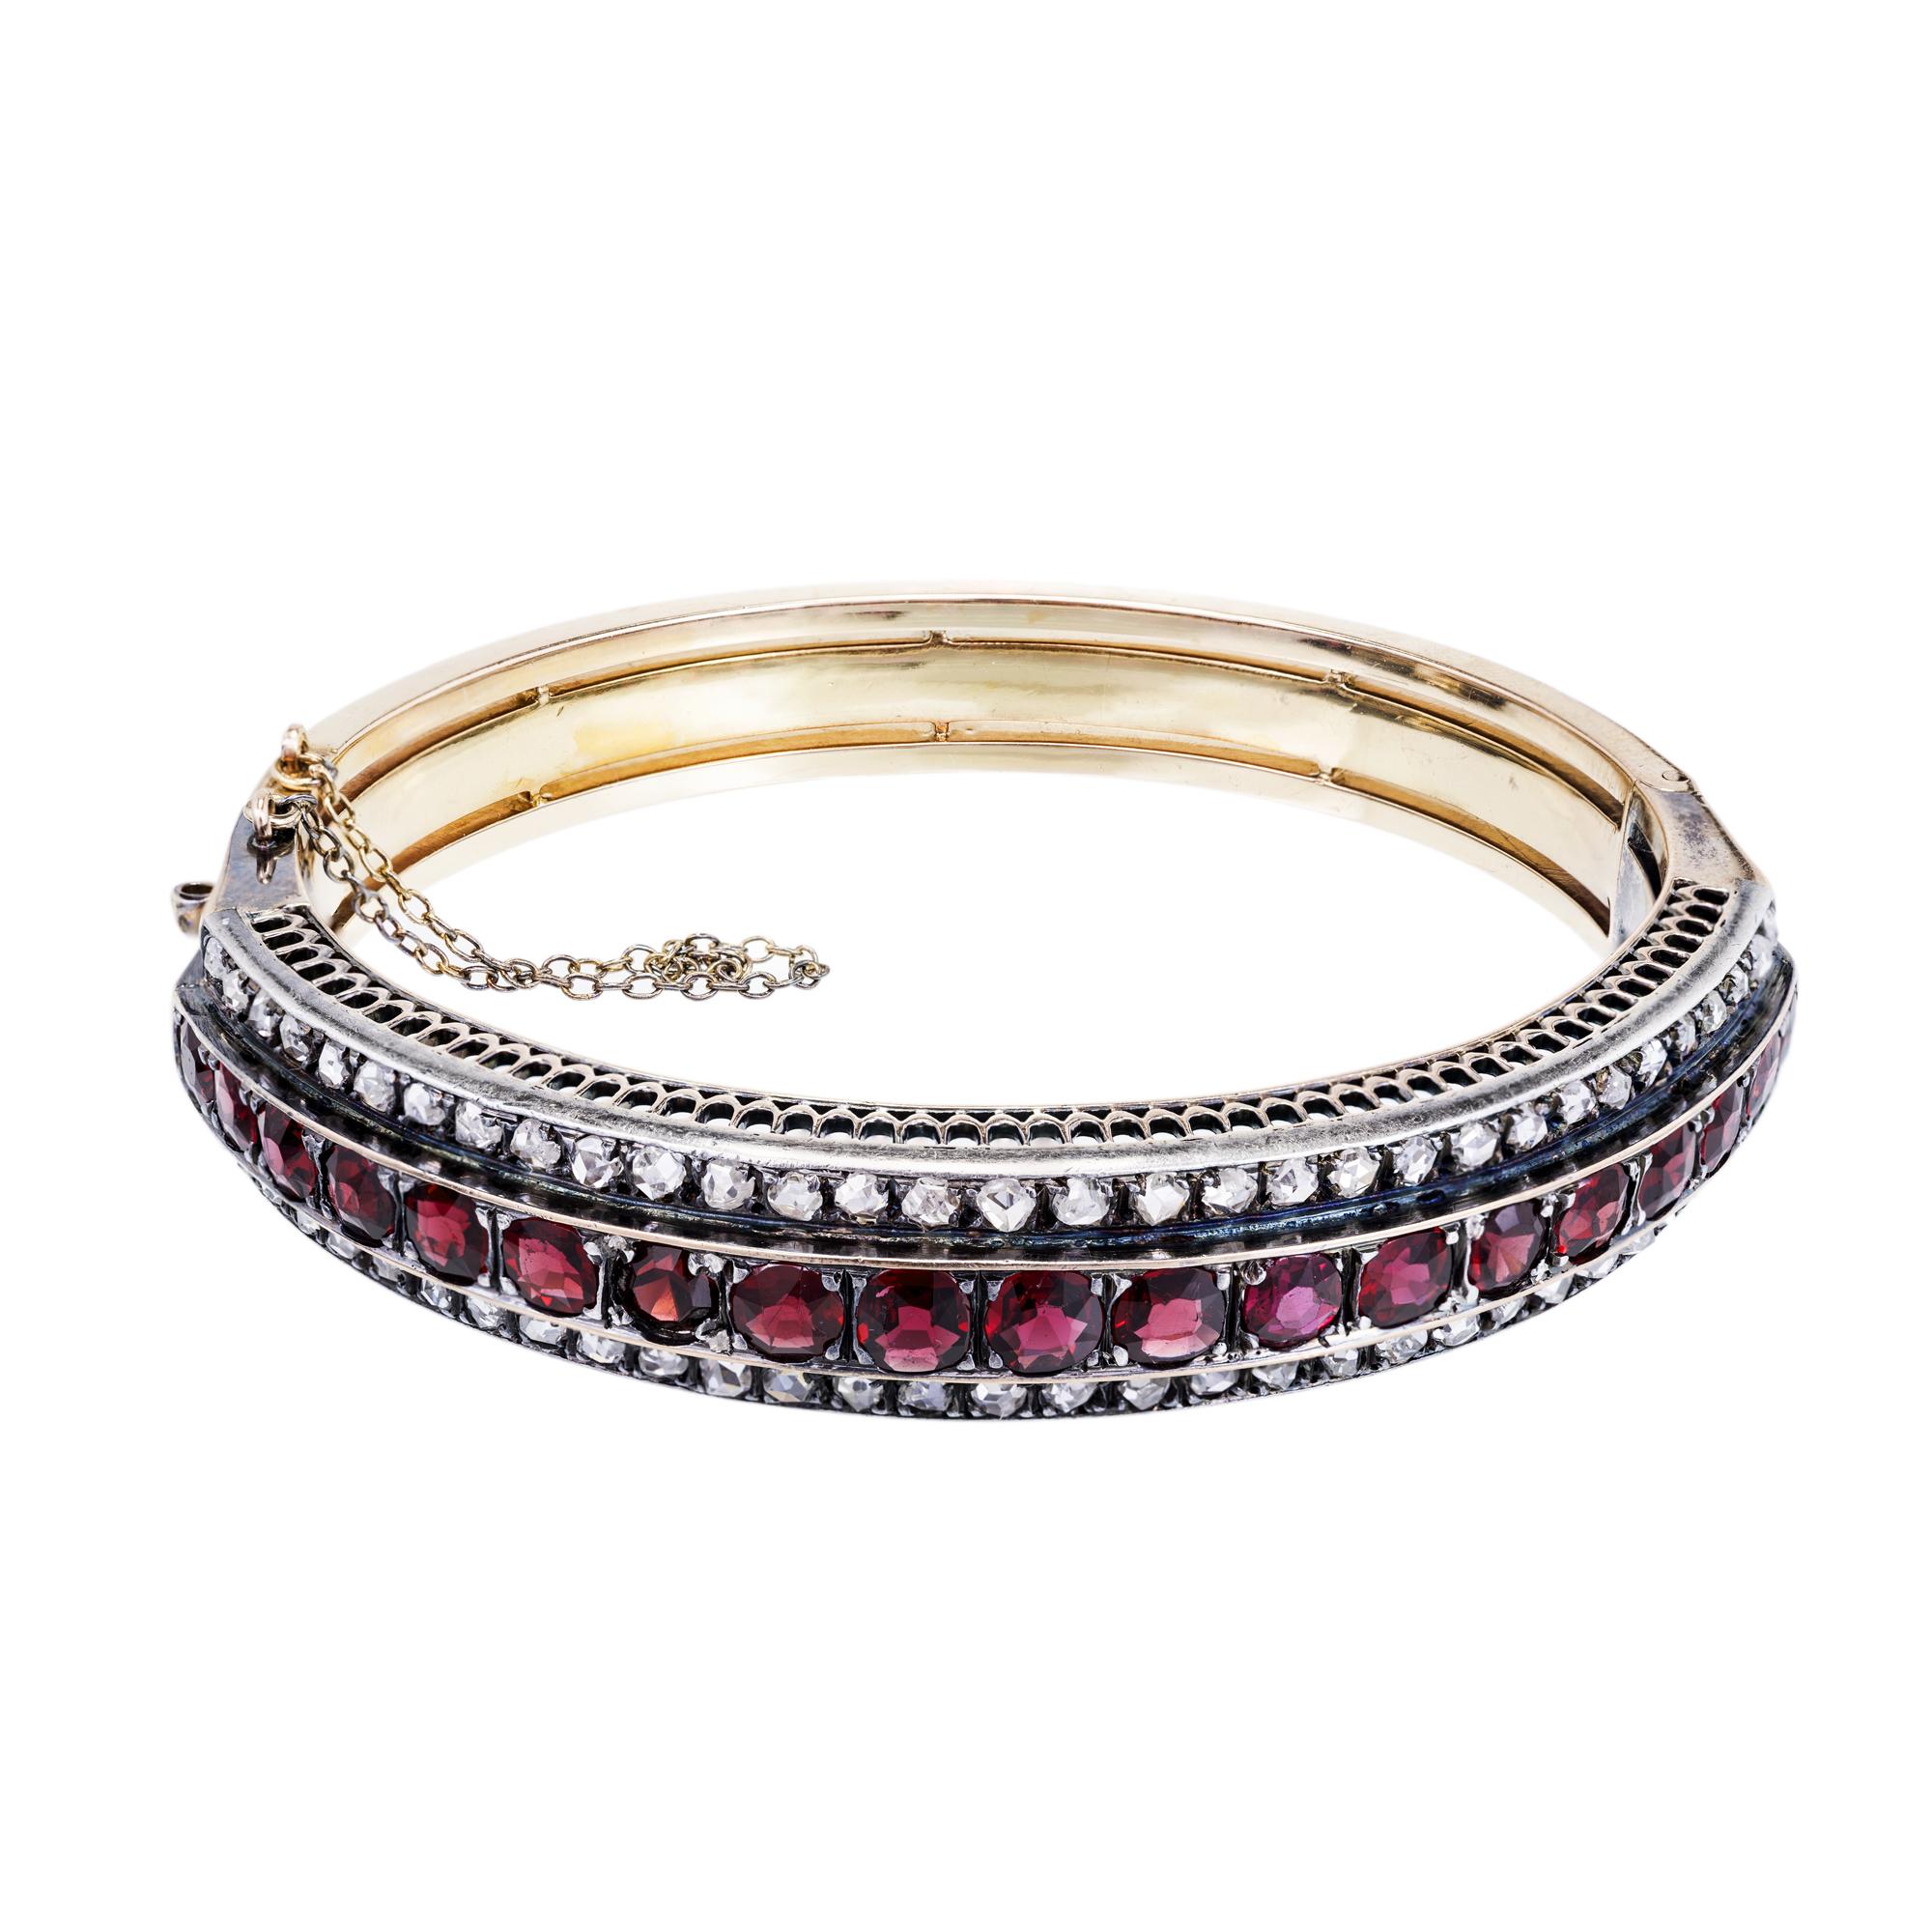 """""18K Yellow Gold with Garnet and Diamond Bangle Bracelet"""""" 2139655"